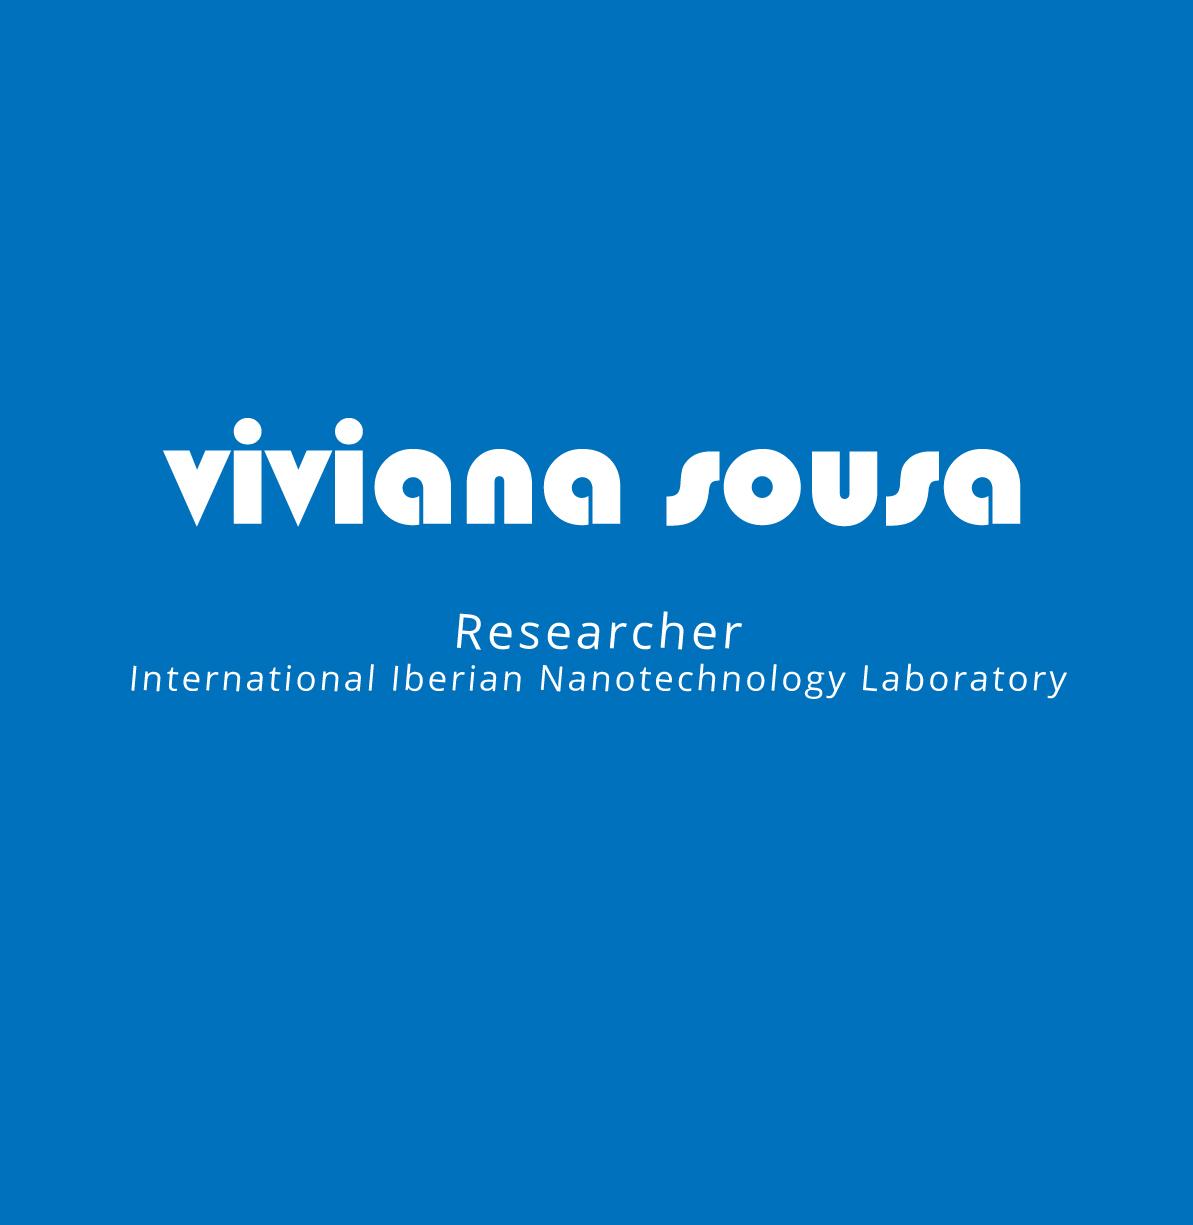 viviana1.jpg